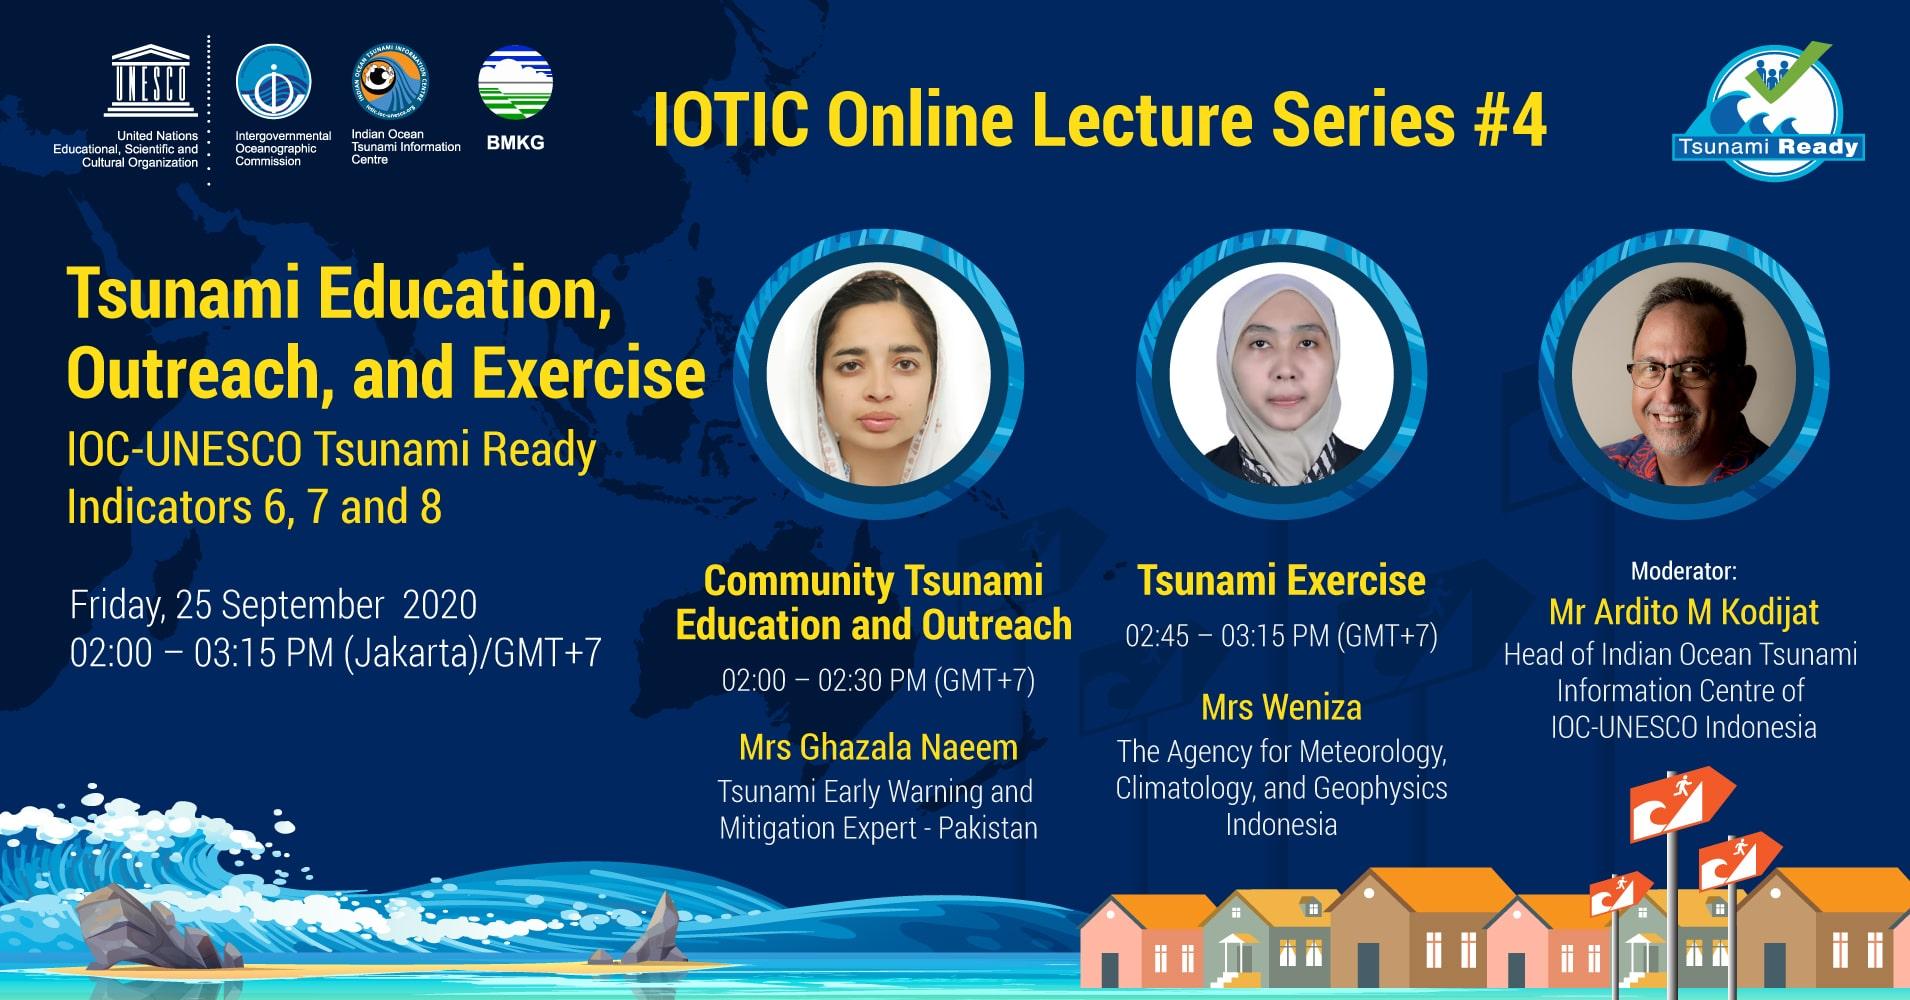 IOTIC Online Lecture Series #4